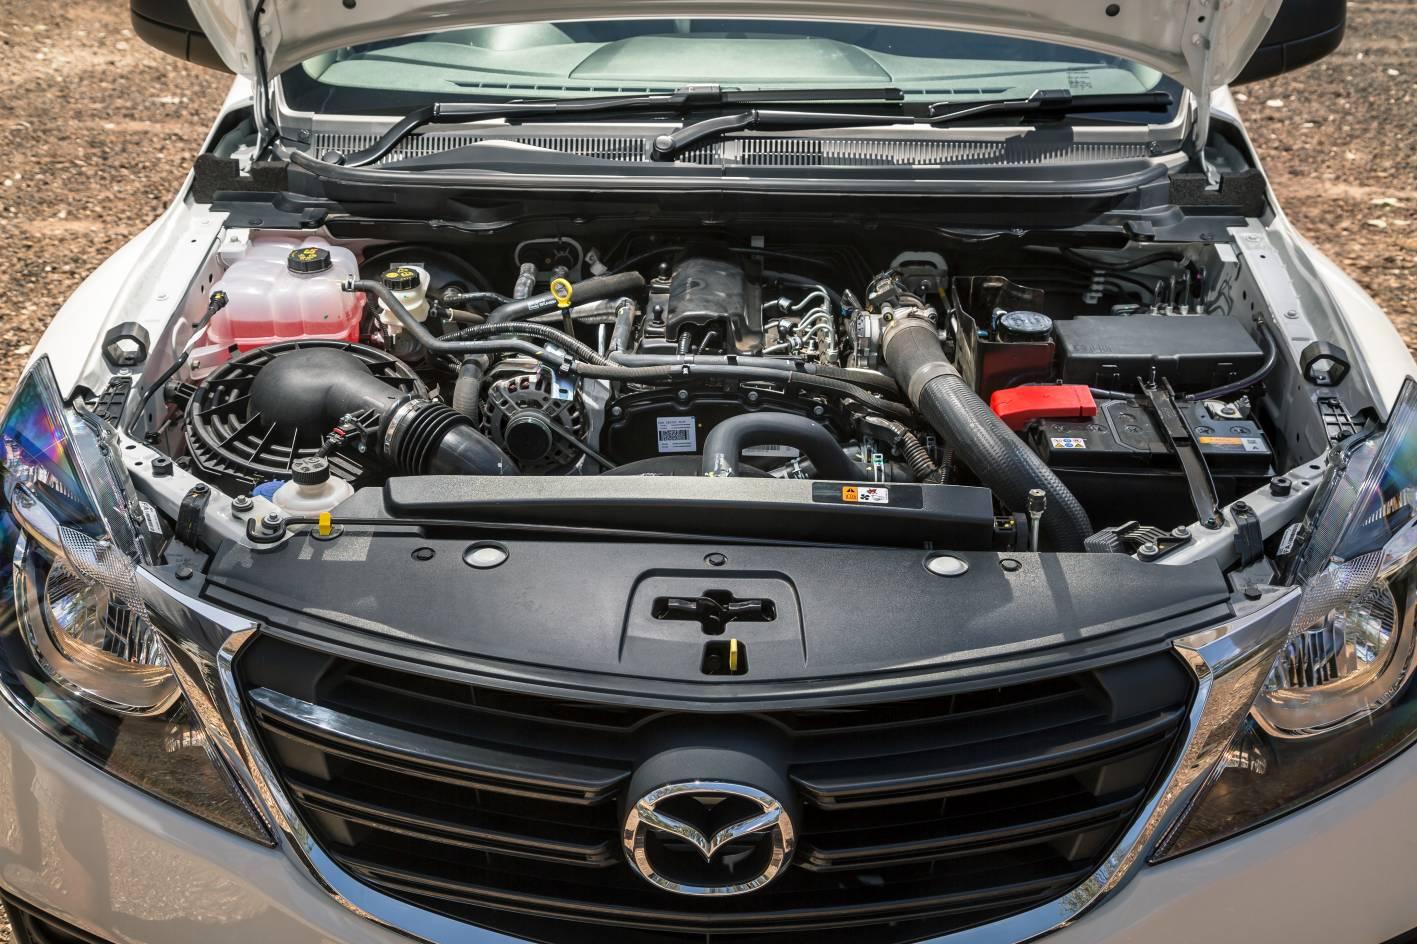 2018 Mazda BT-50 16.jpg